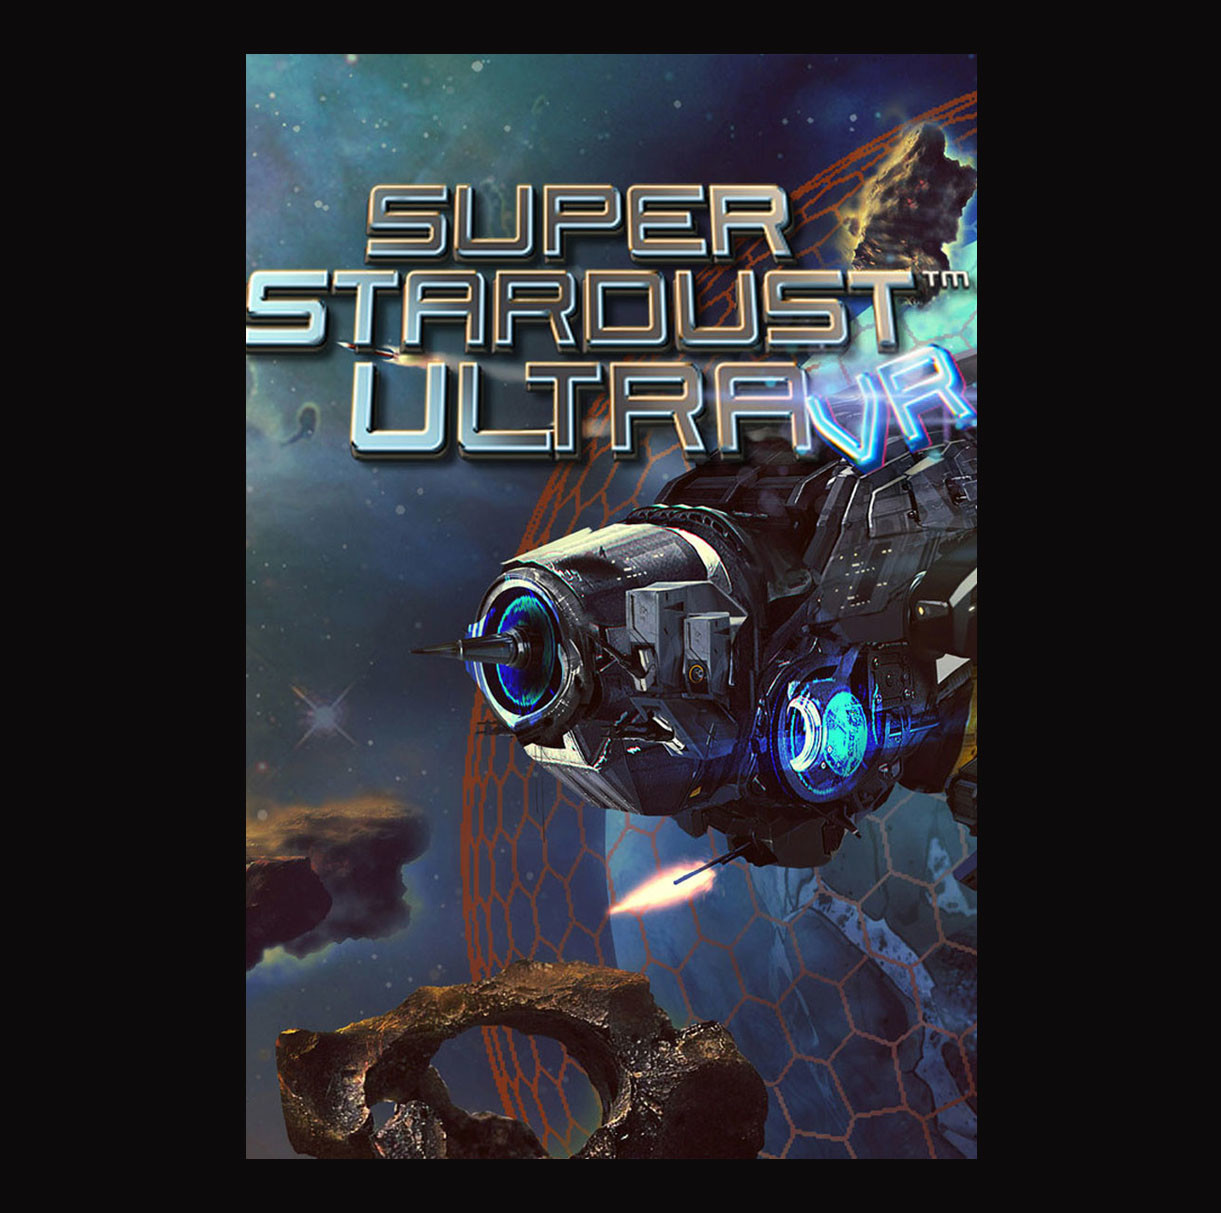 SUPER STARDUST VR :  Oculus rift